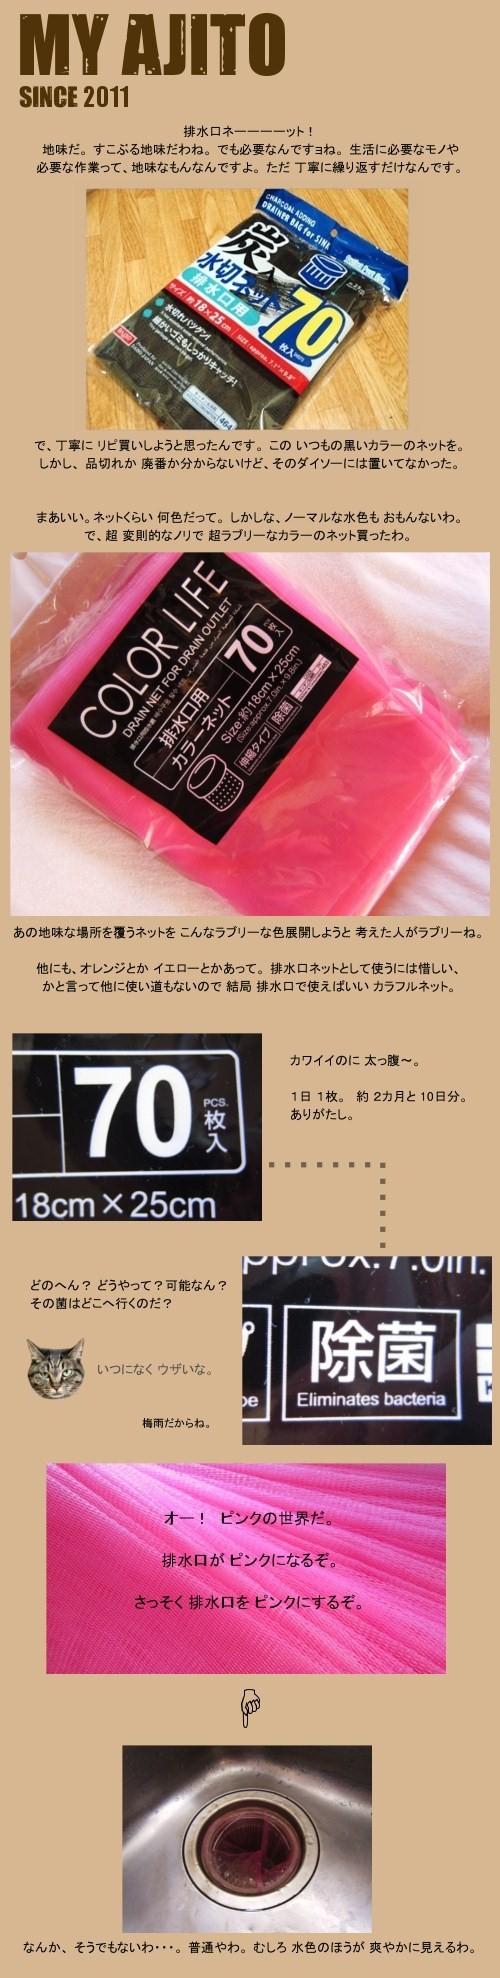 TSUYU_2.jpg